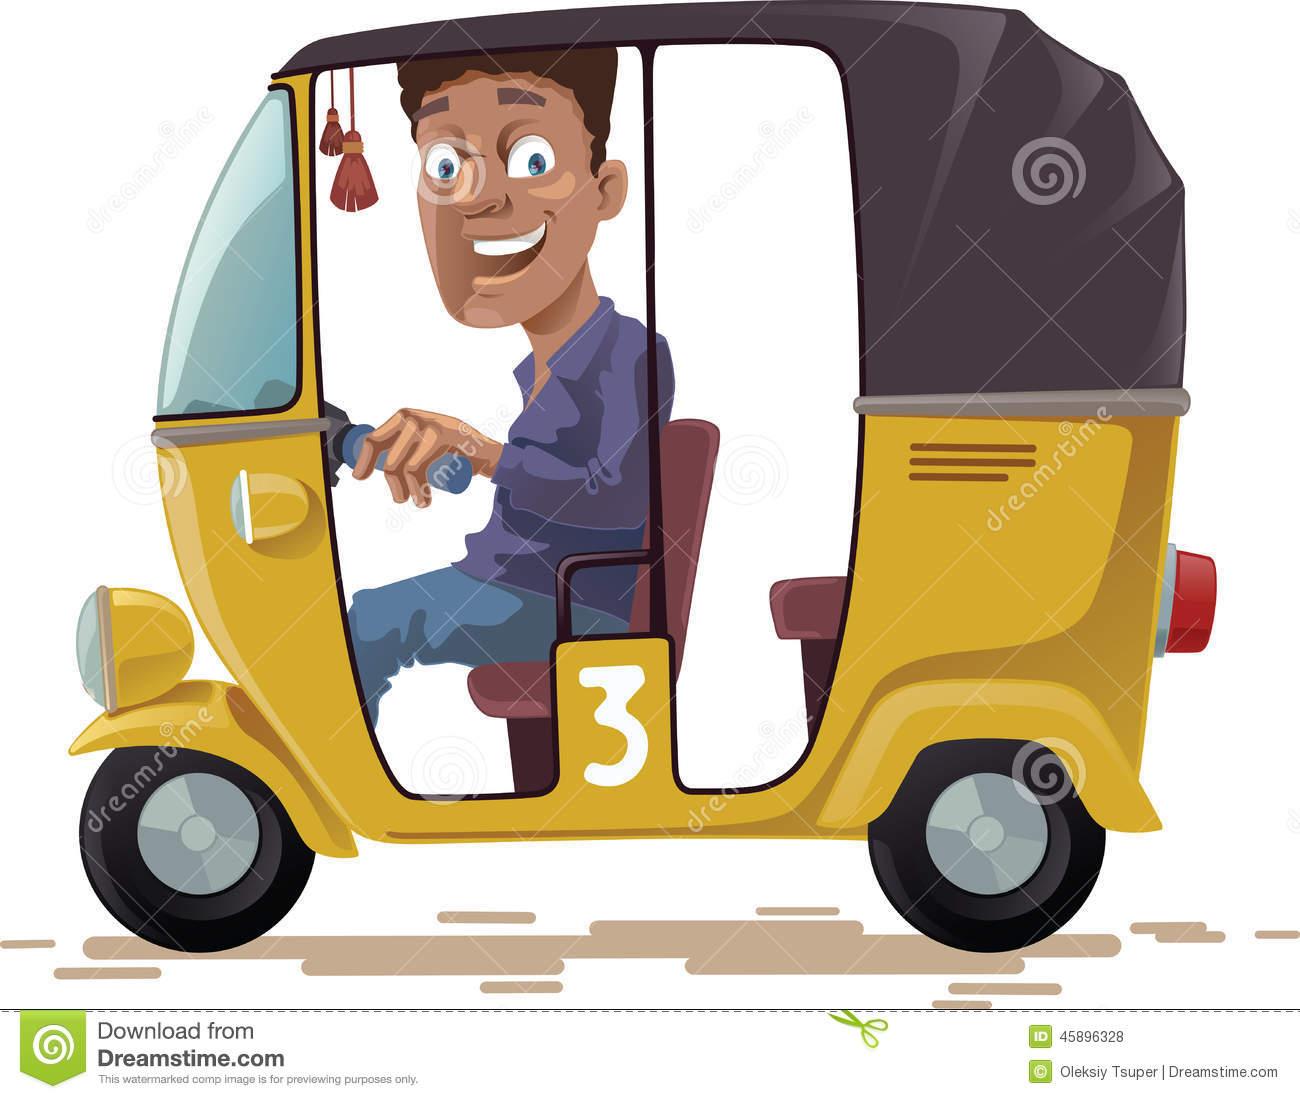 Auto rickshaw clipart.